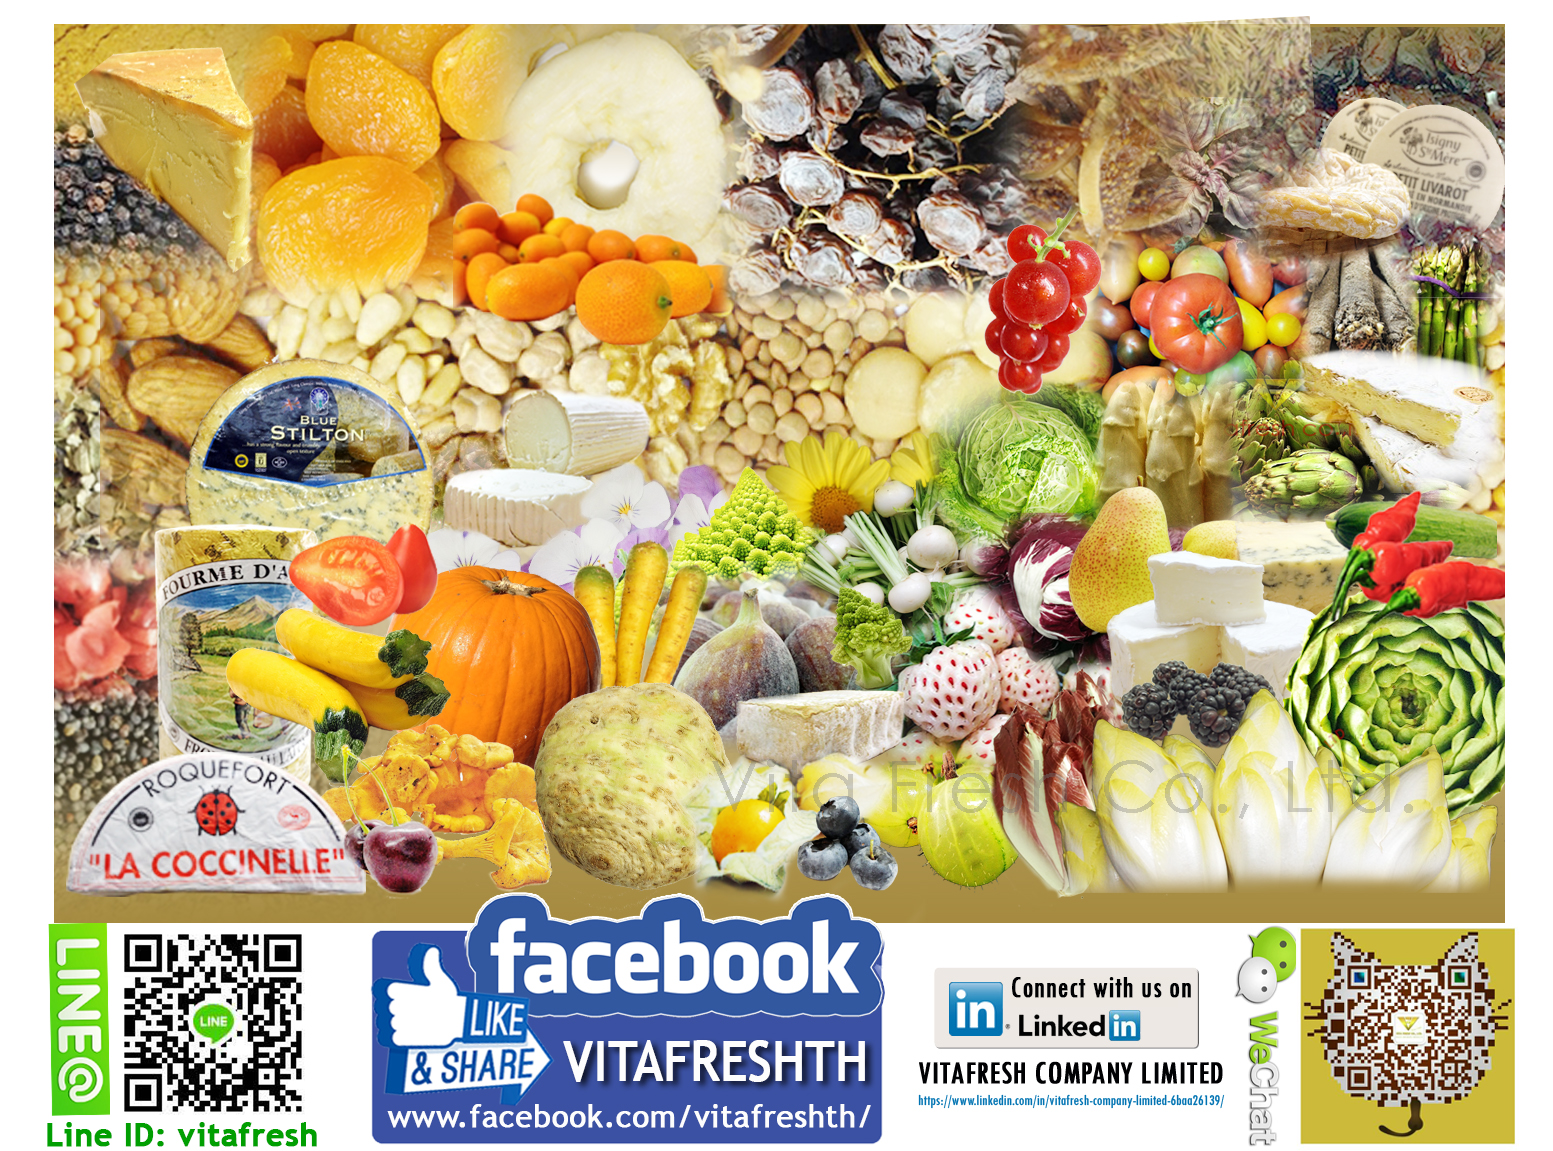 Vitafresh Finest imported food Thailand | VITAFRESH , Finest Imported